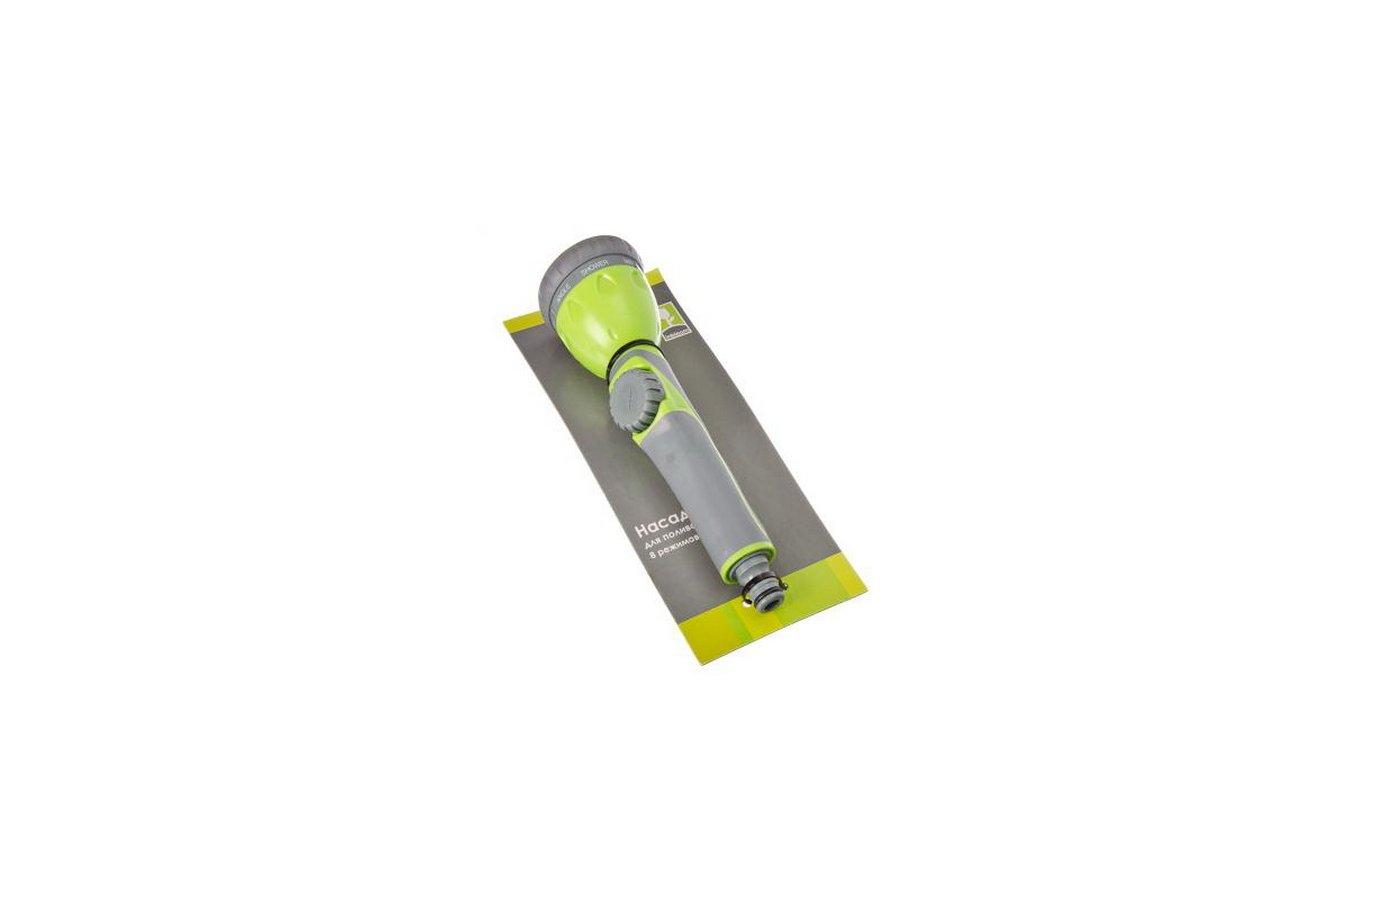 Система ручного полива INBLOOM Насадка для полива 8 режимов пластик 161-001